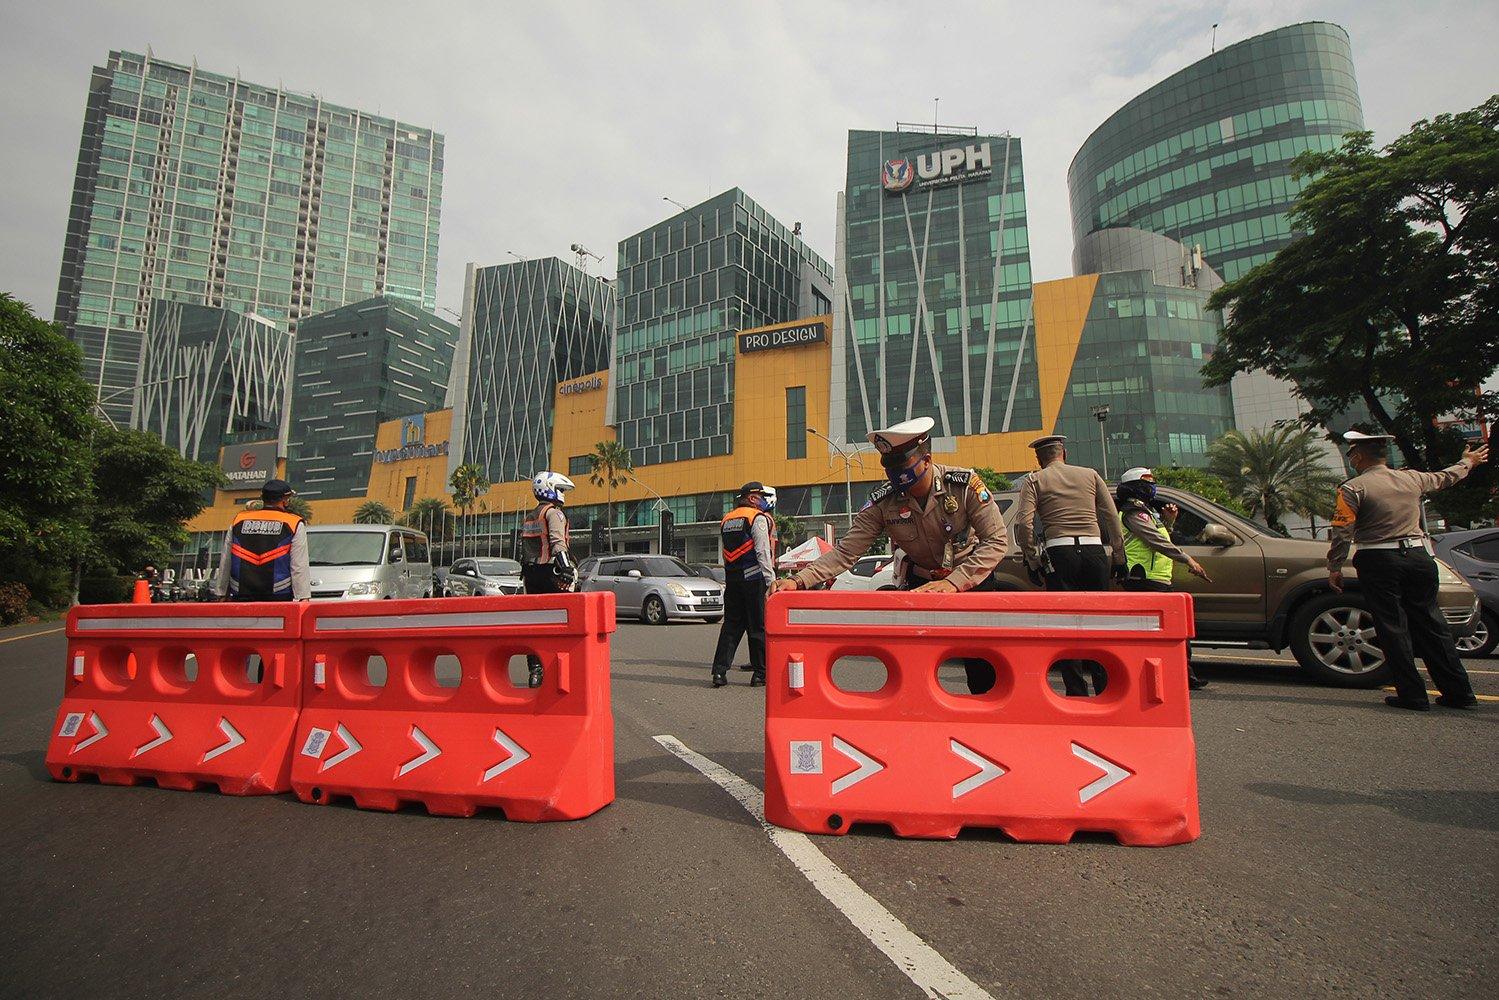 Polisi memasang \'water barrier\' saat pelaksanaan Pembatasan Sosial Berskala Besar (PSBB) di Surabaya di Bundaran Waru, Surabaya, Jawa Timur.